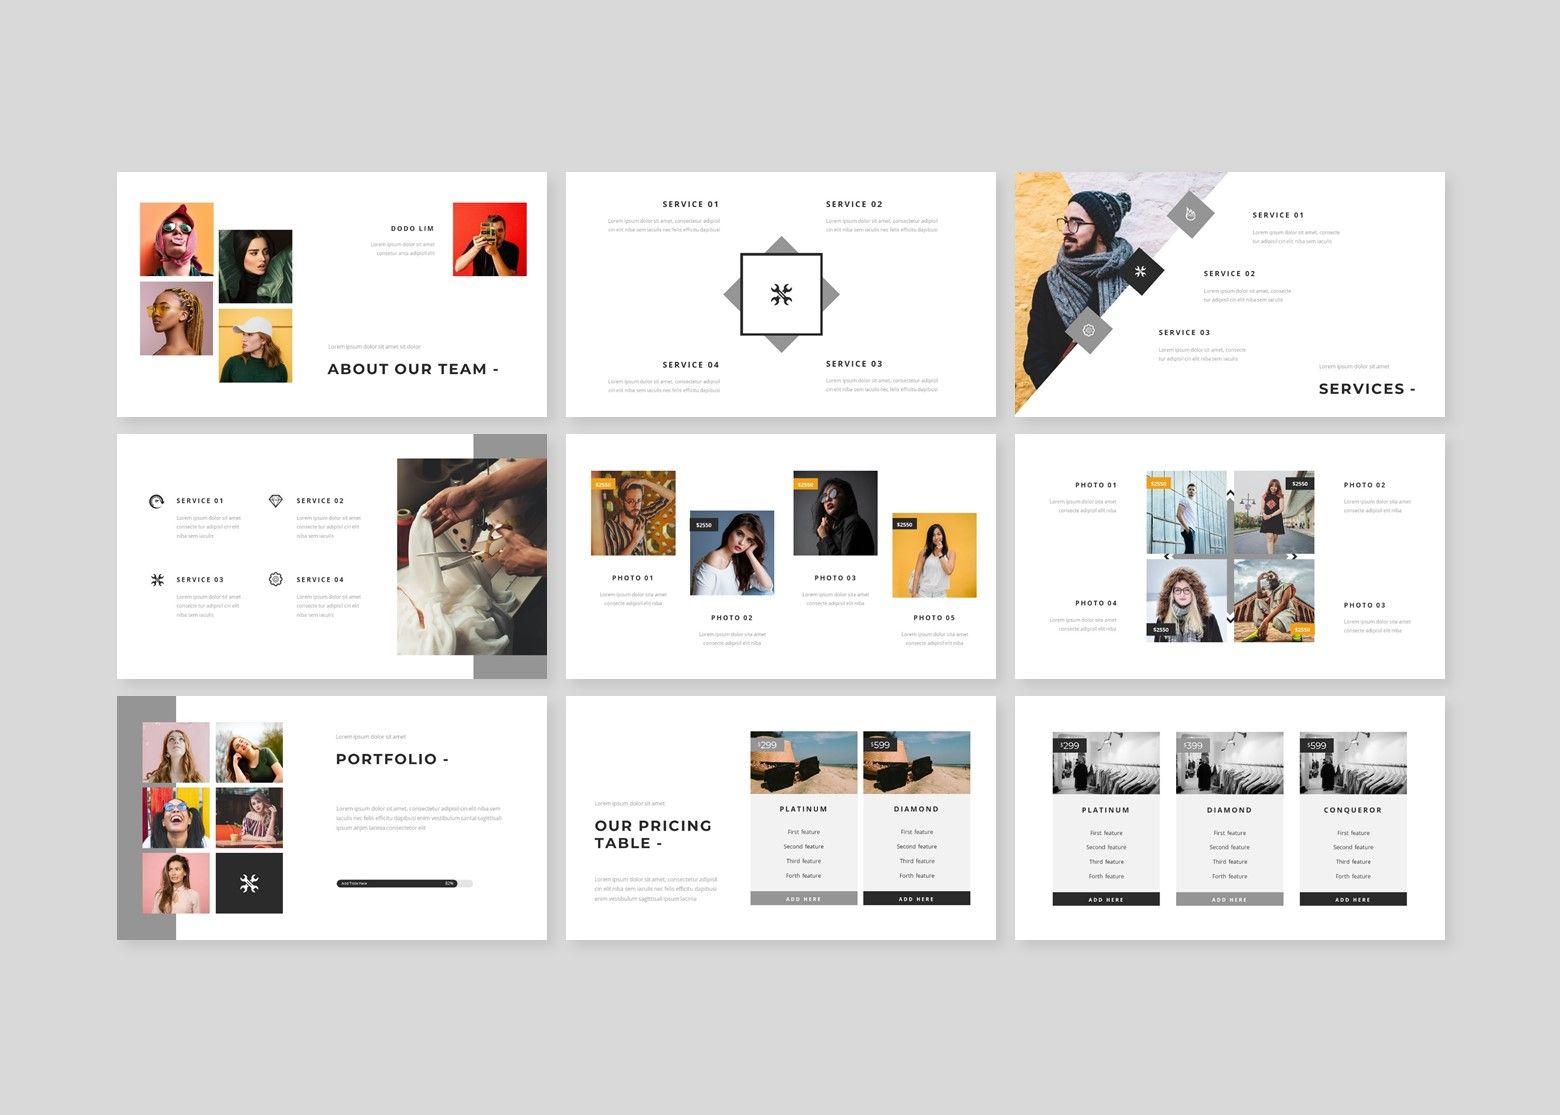 Fasionable – Creative Google Slide Business Template, Slide 3, 08642, Business Models — PoweredTemplate.com